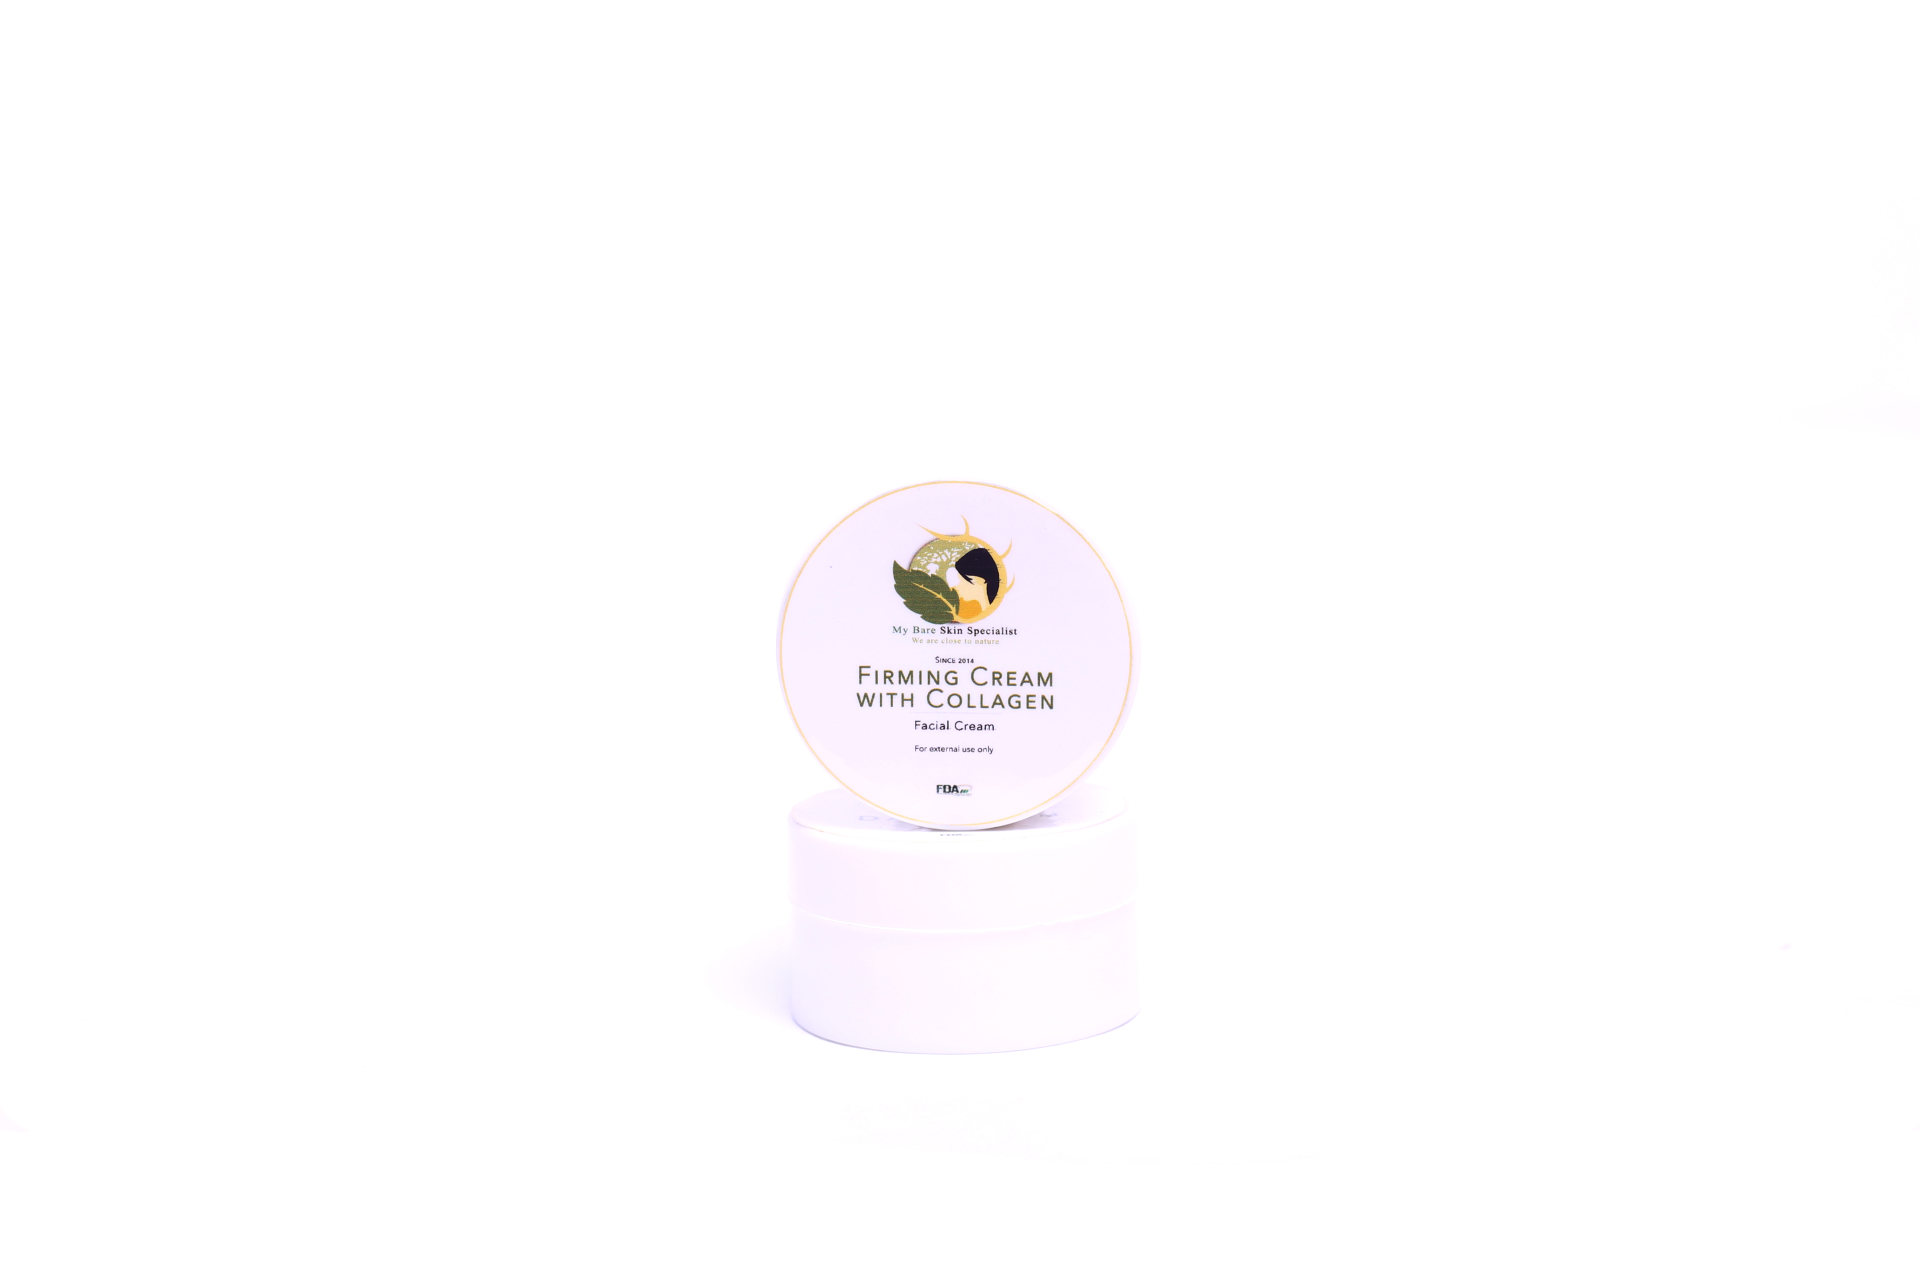 Firming Cream with Collagen